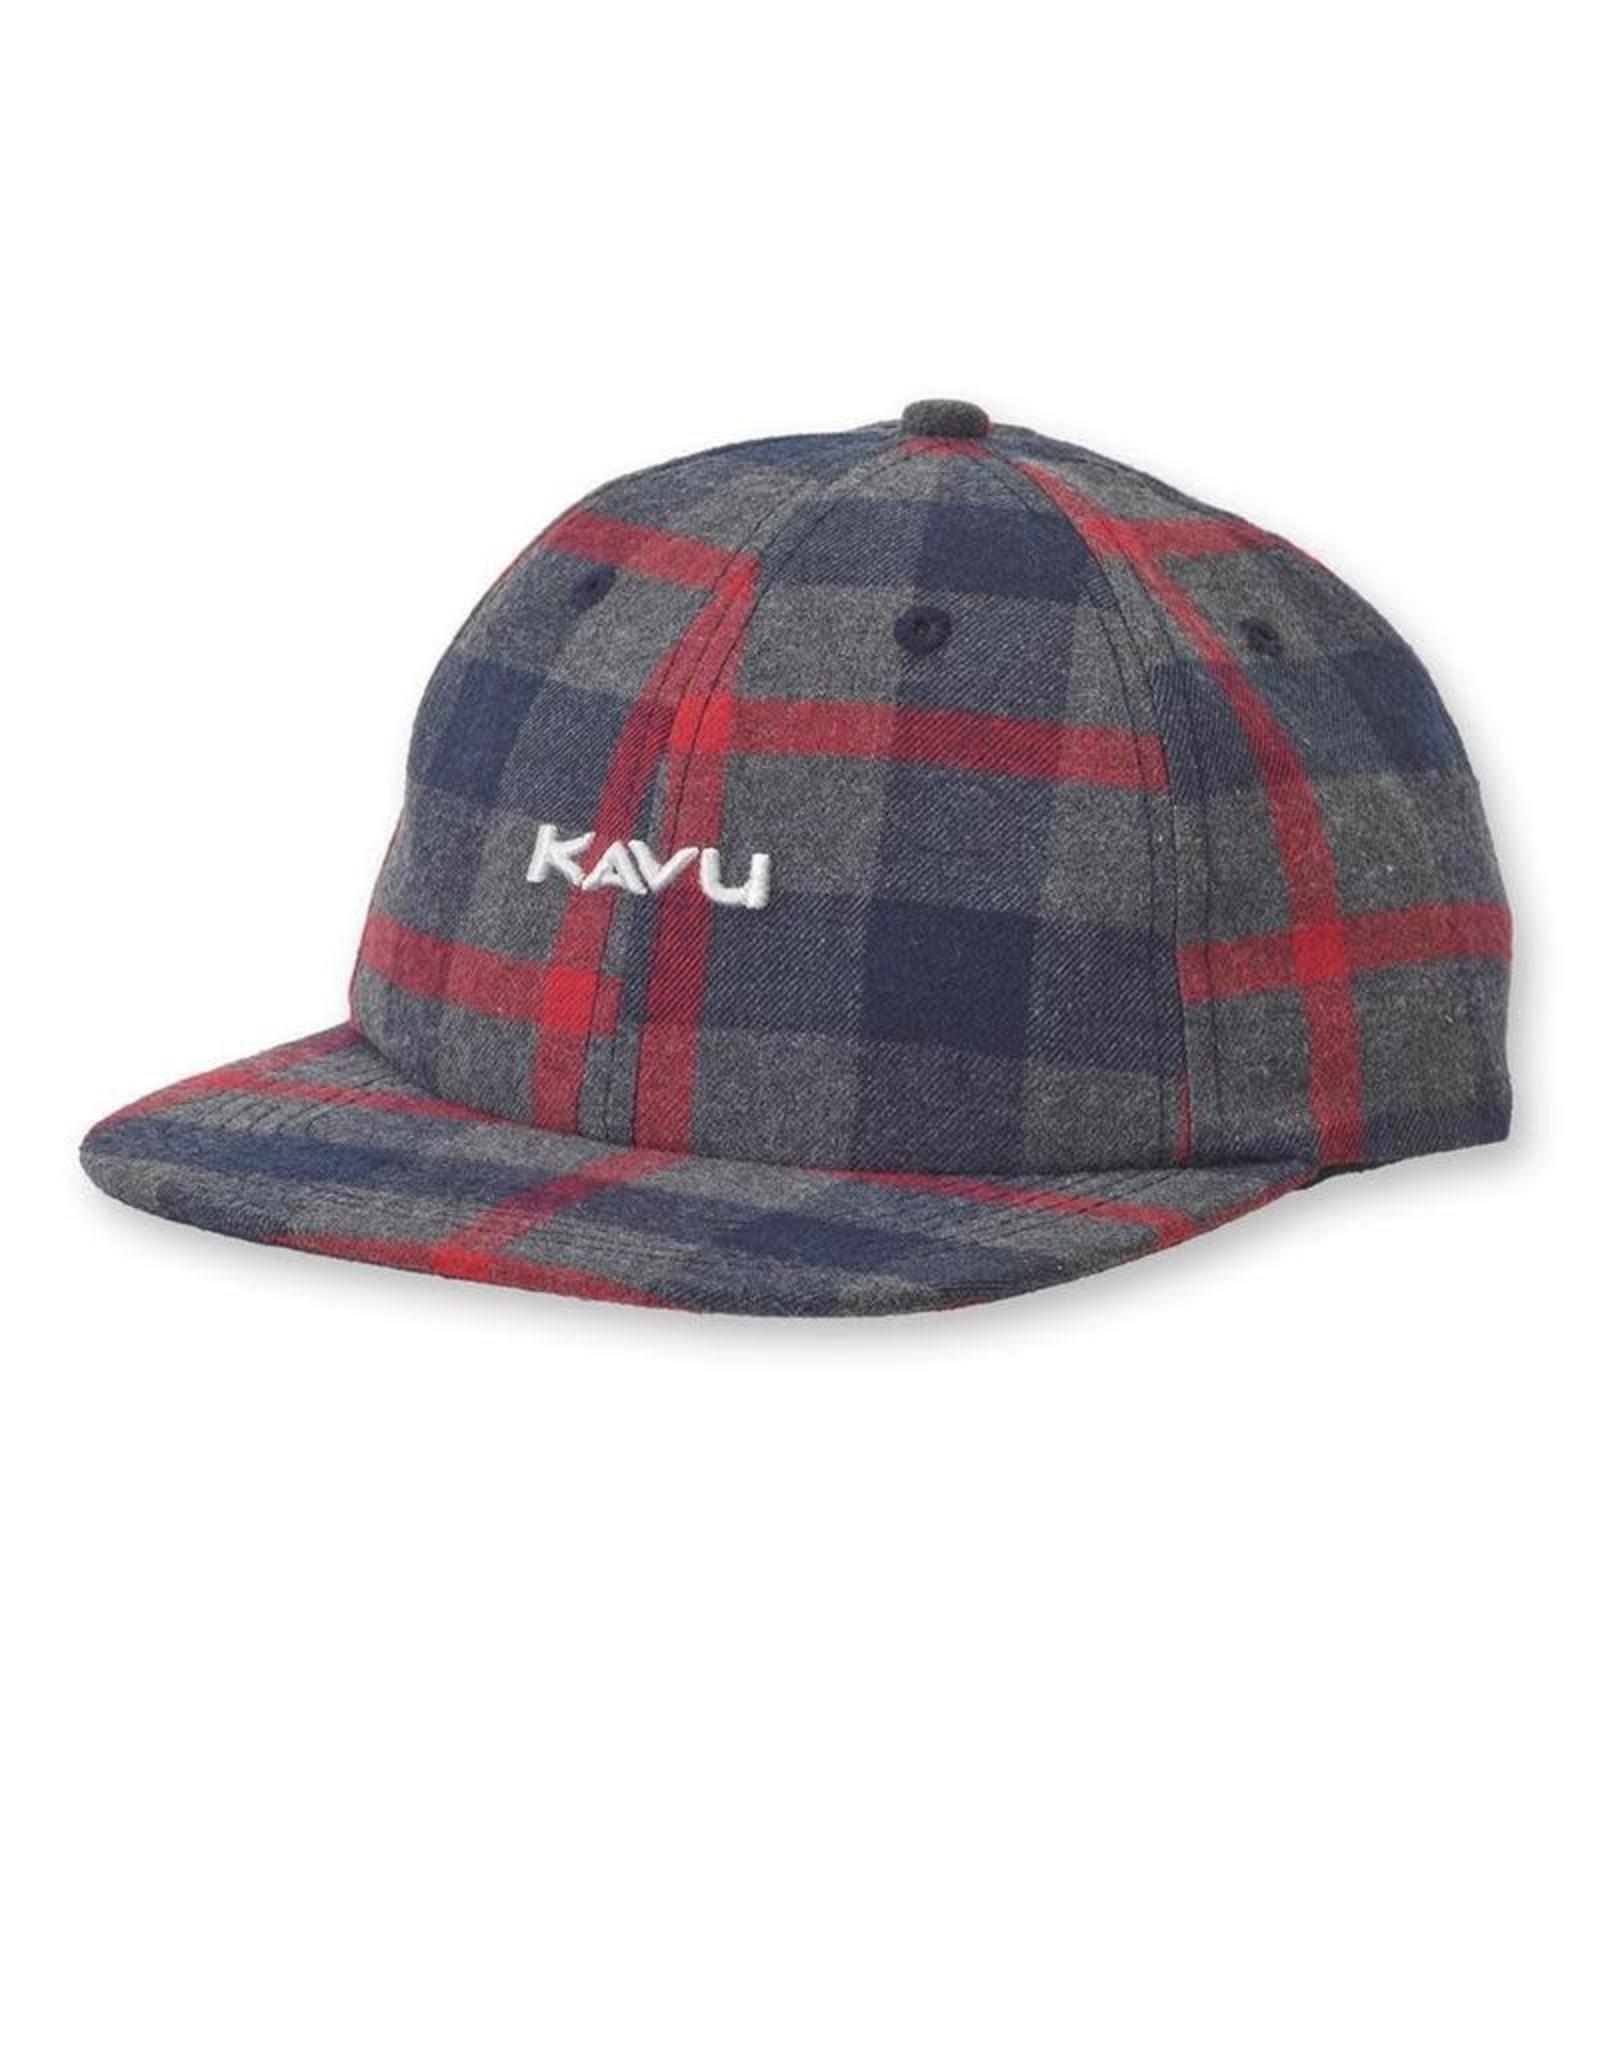 Kavu Kavu Cabin Fever Cap